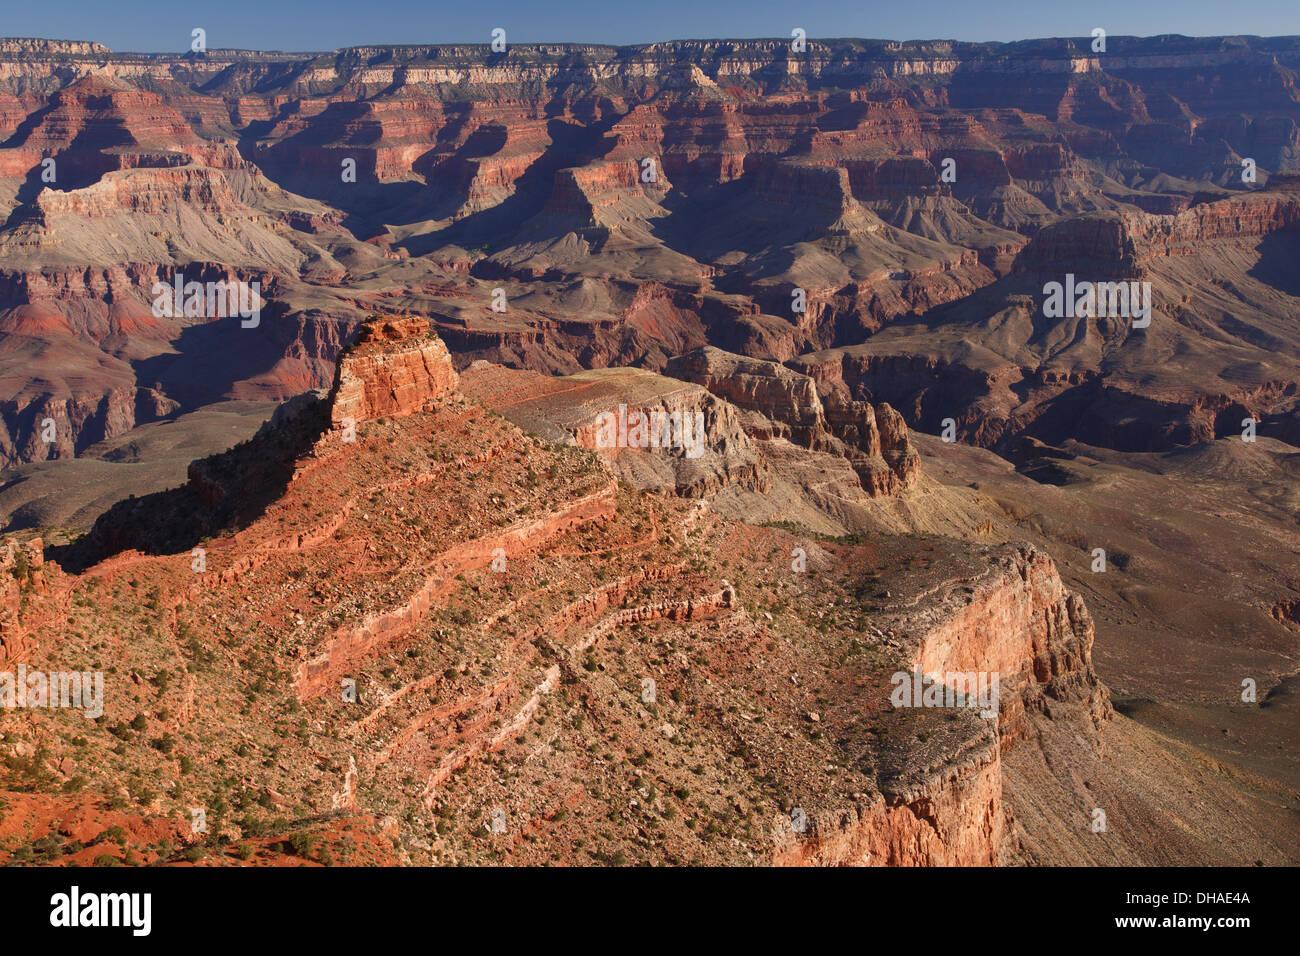 South Kaibab Trail, Grand Canyon National Park, Arizona. - Stock Image